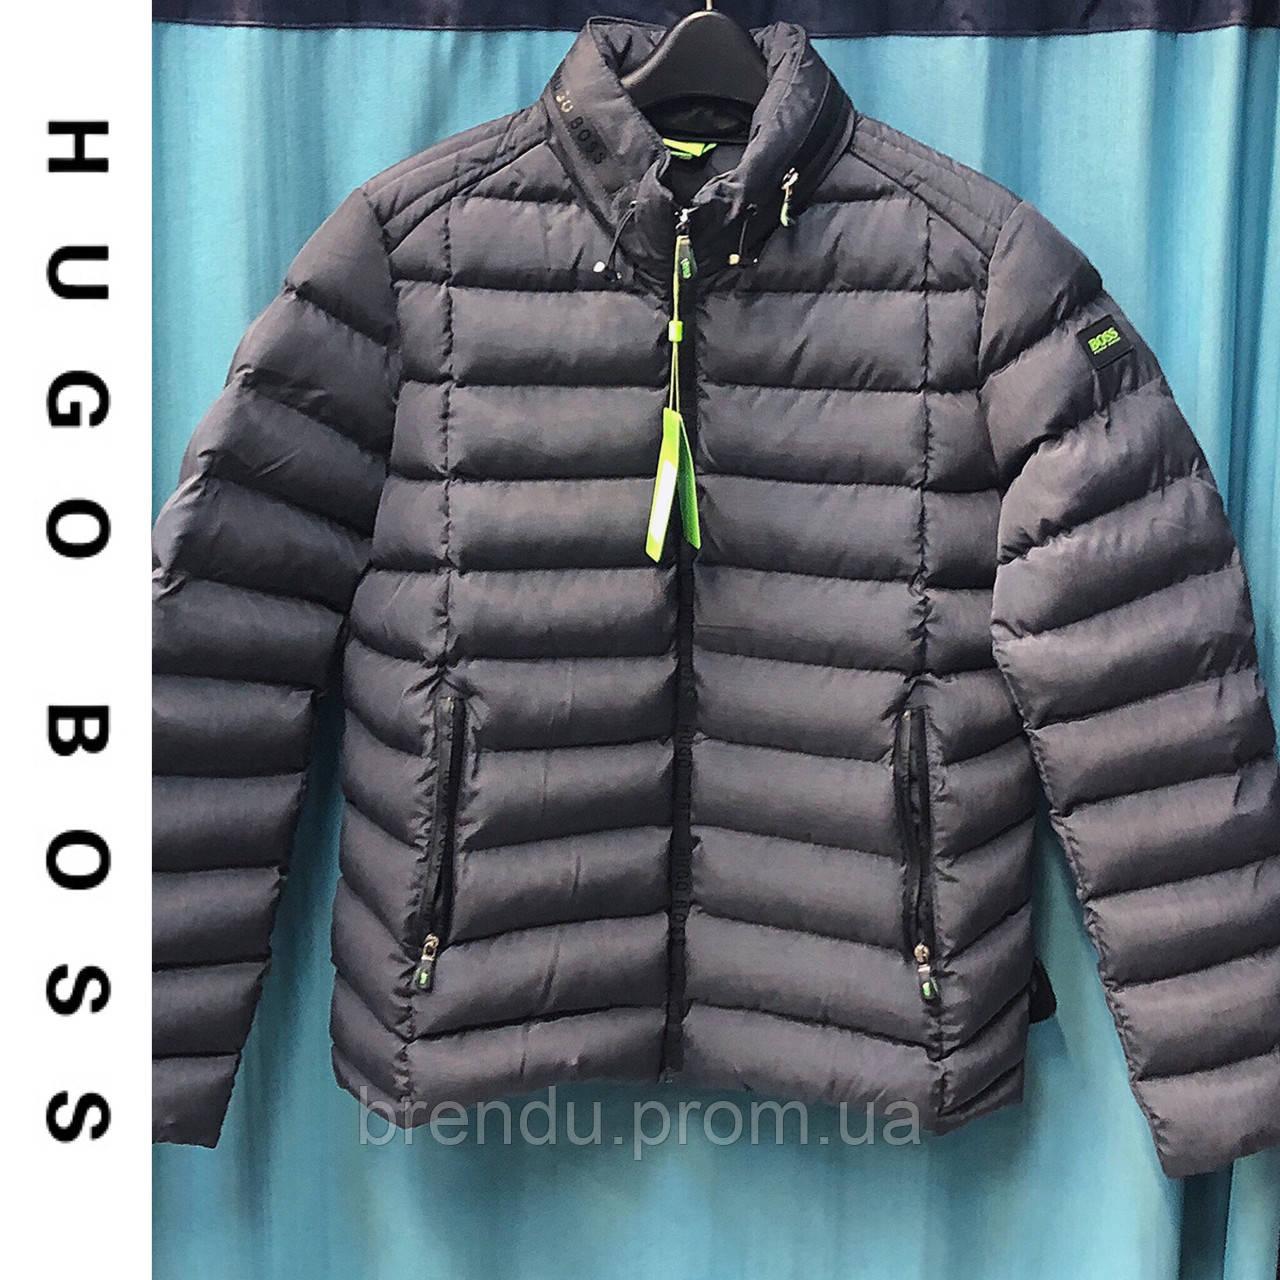 39665e51 Мужские Куртки Hugo Boss , цена 4 500 грн., купить в Киеве — Prom.ua  (ID#783617500)